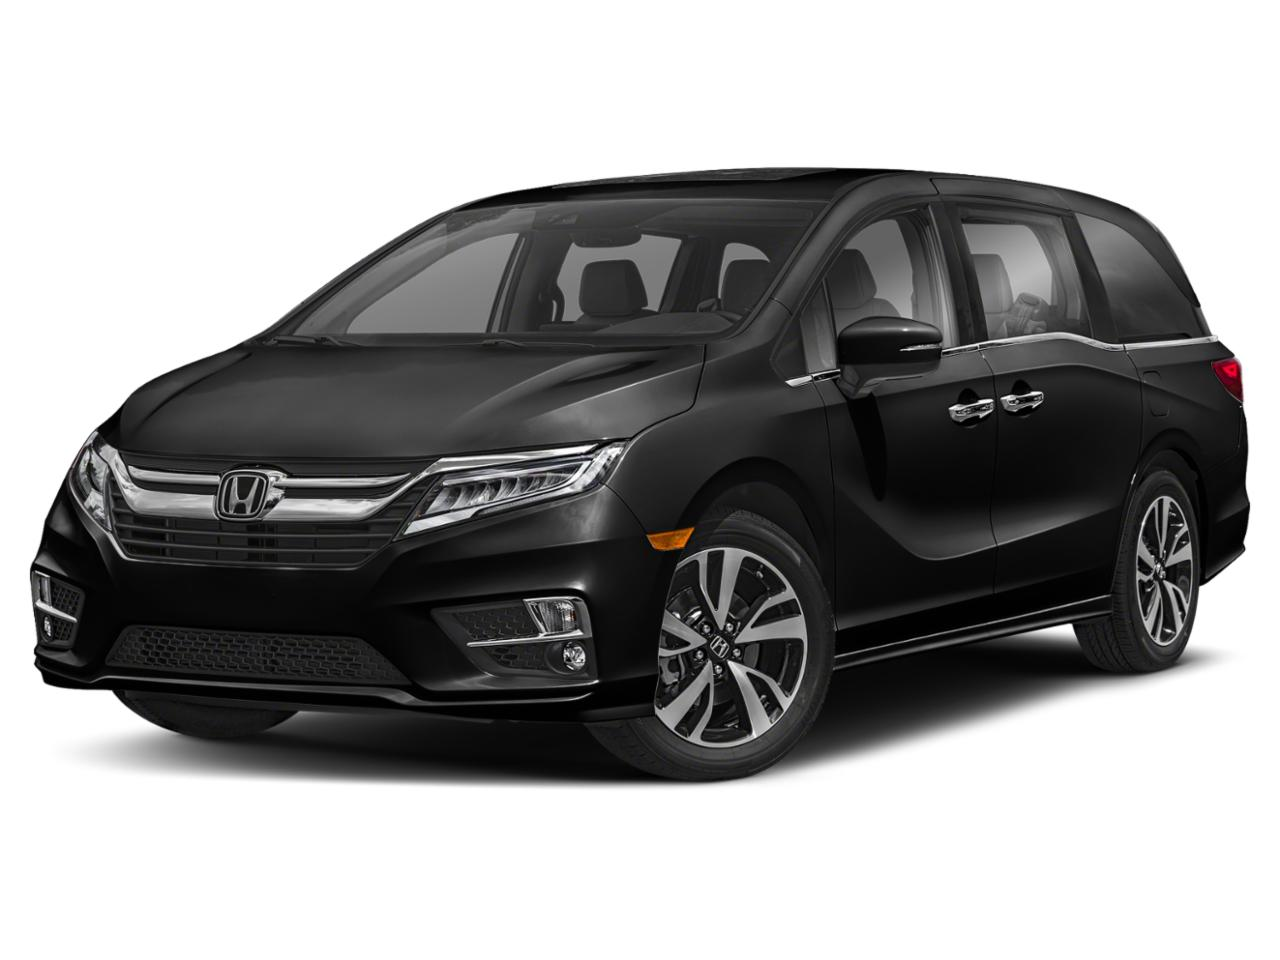 2020 Honda Odyssey Vehicle Photo in Owensboro, KY 42303